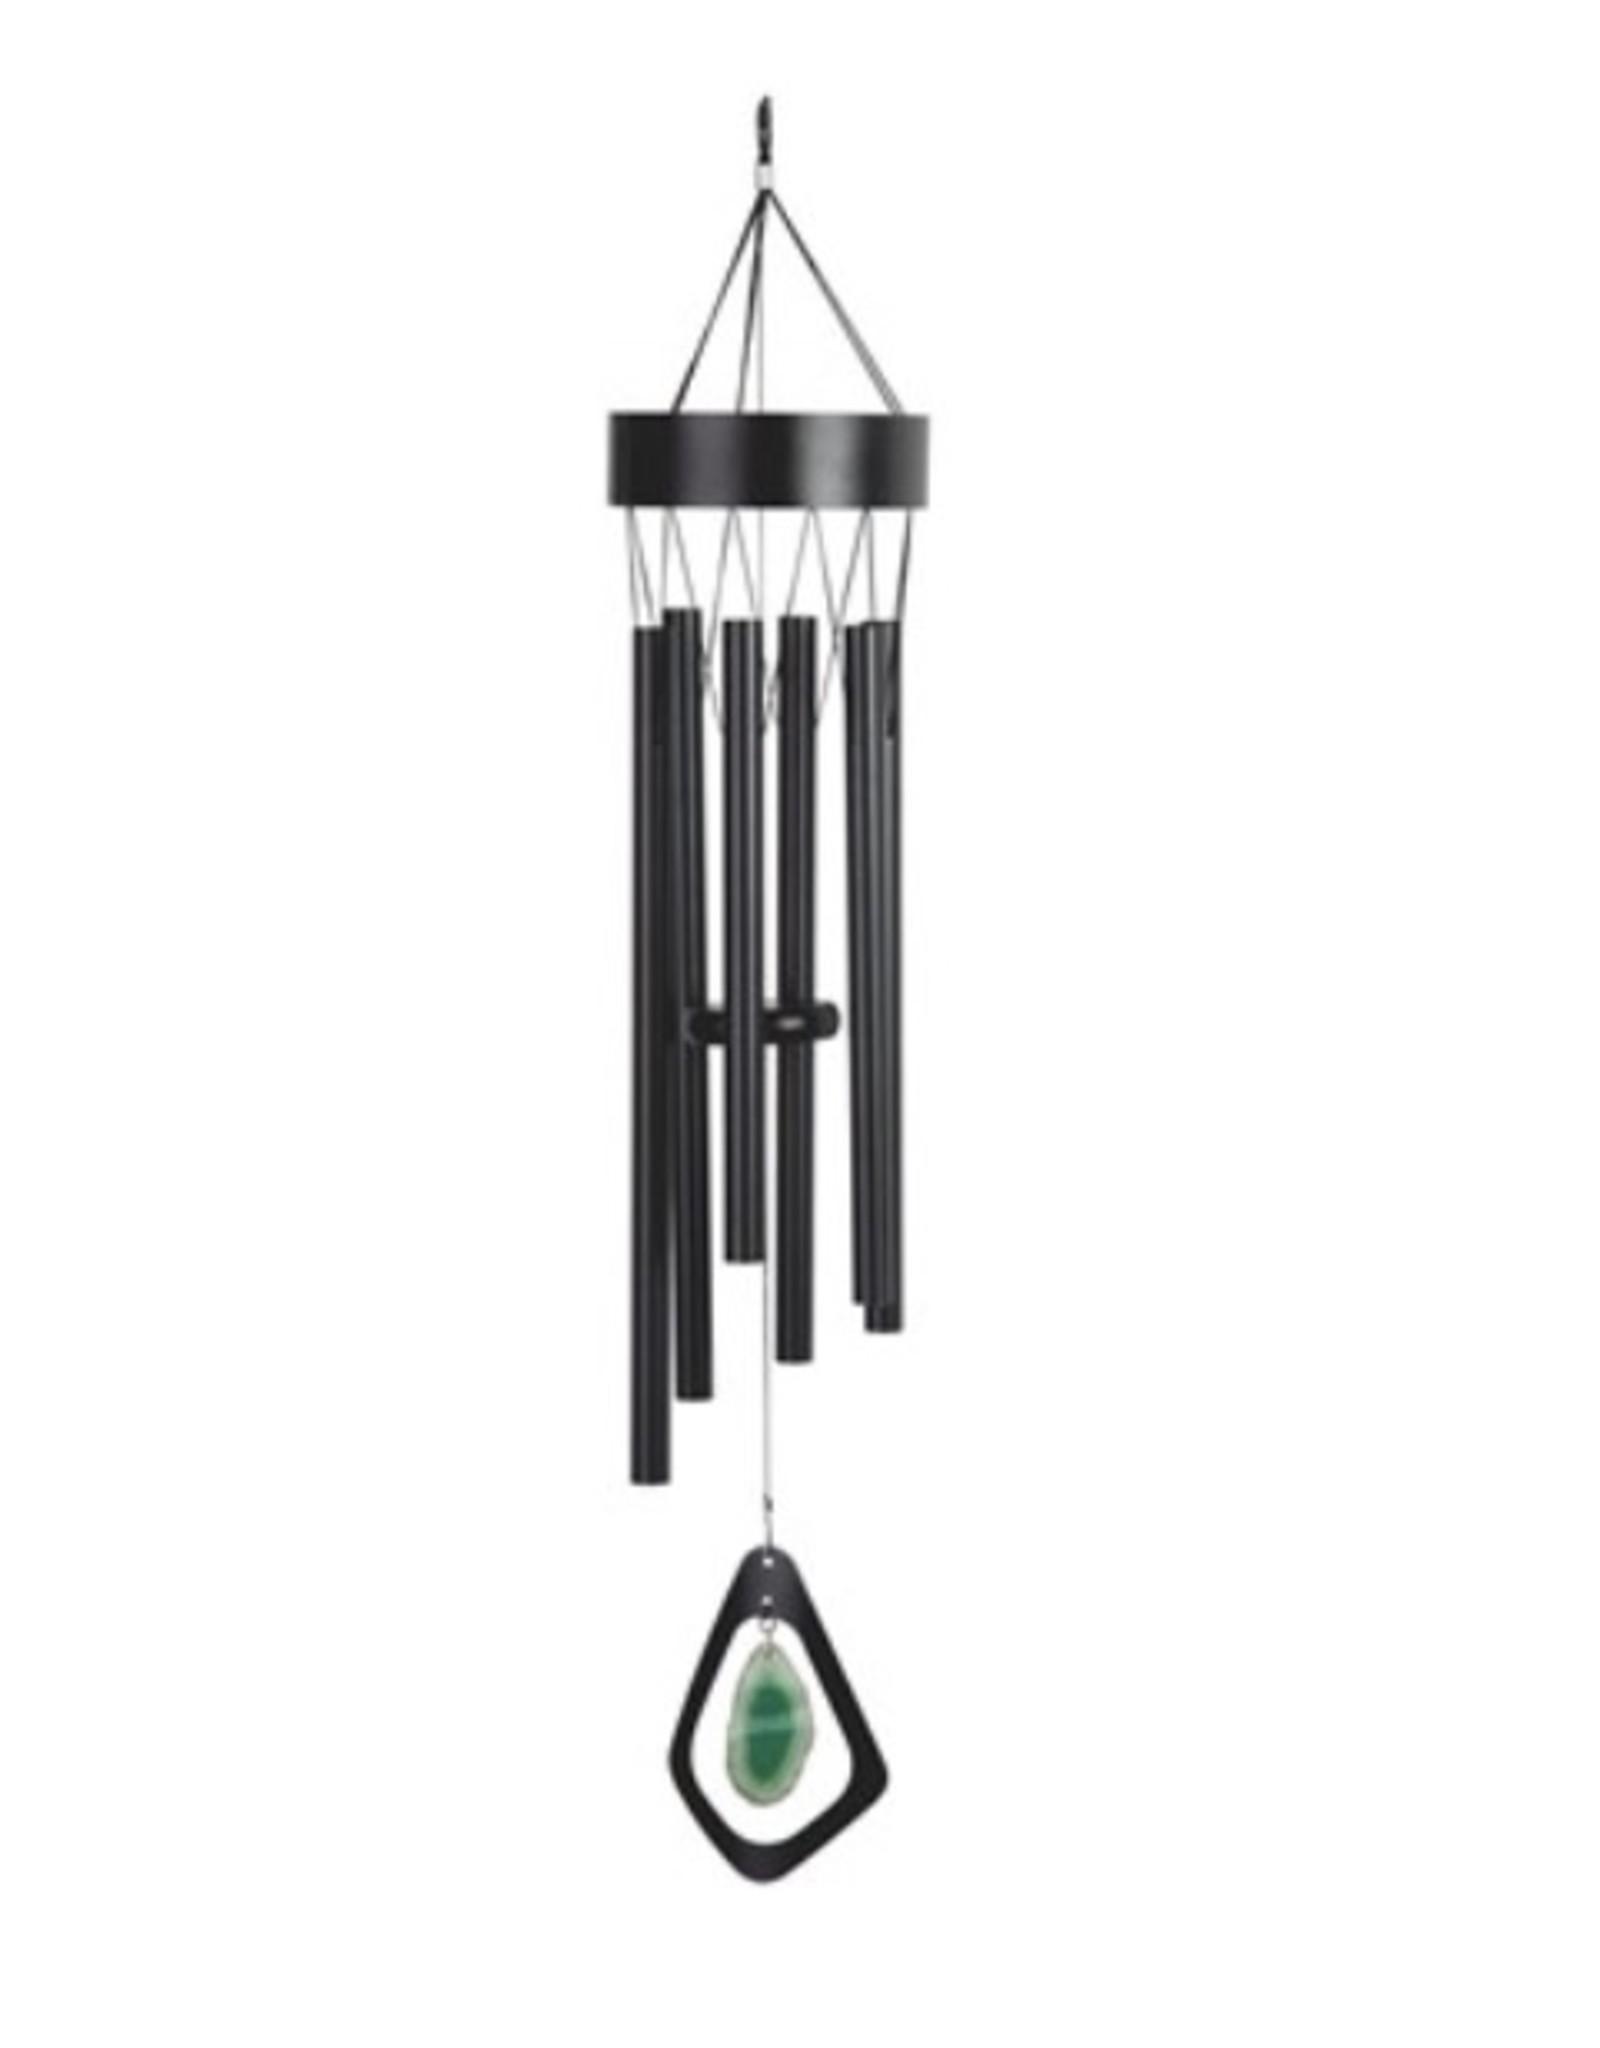 Black Metal Wind Chime Windchime Mobile 33 inch